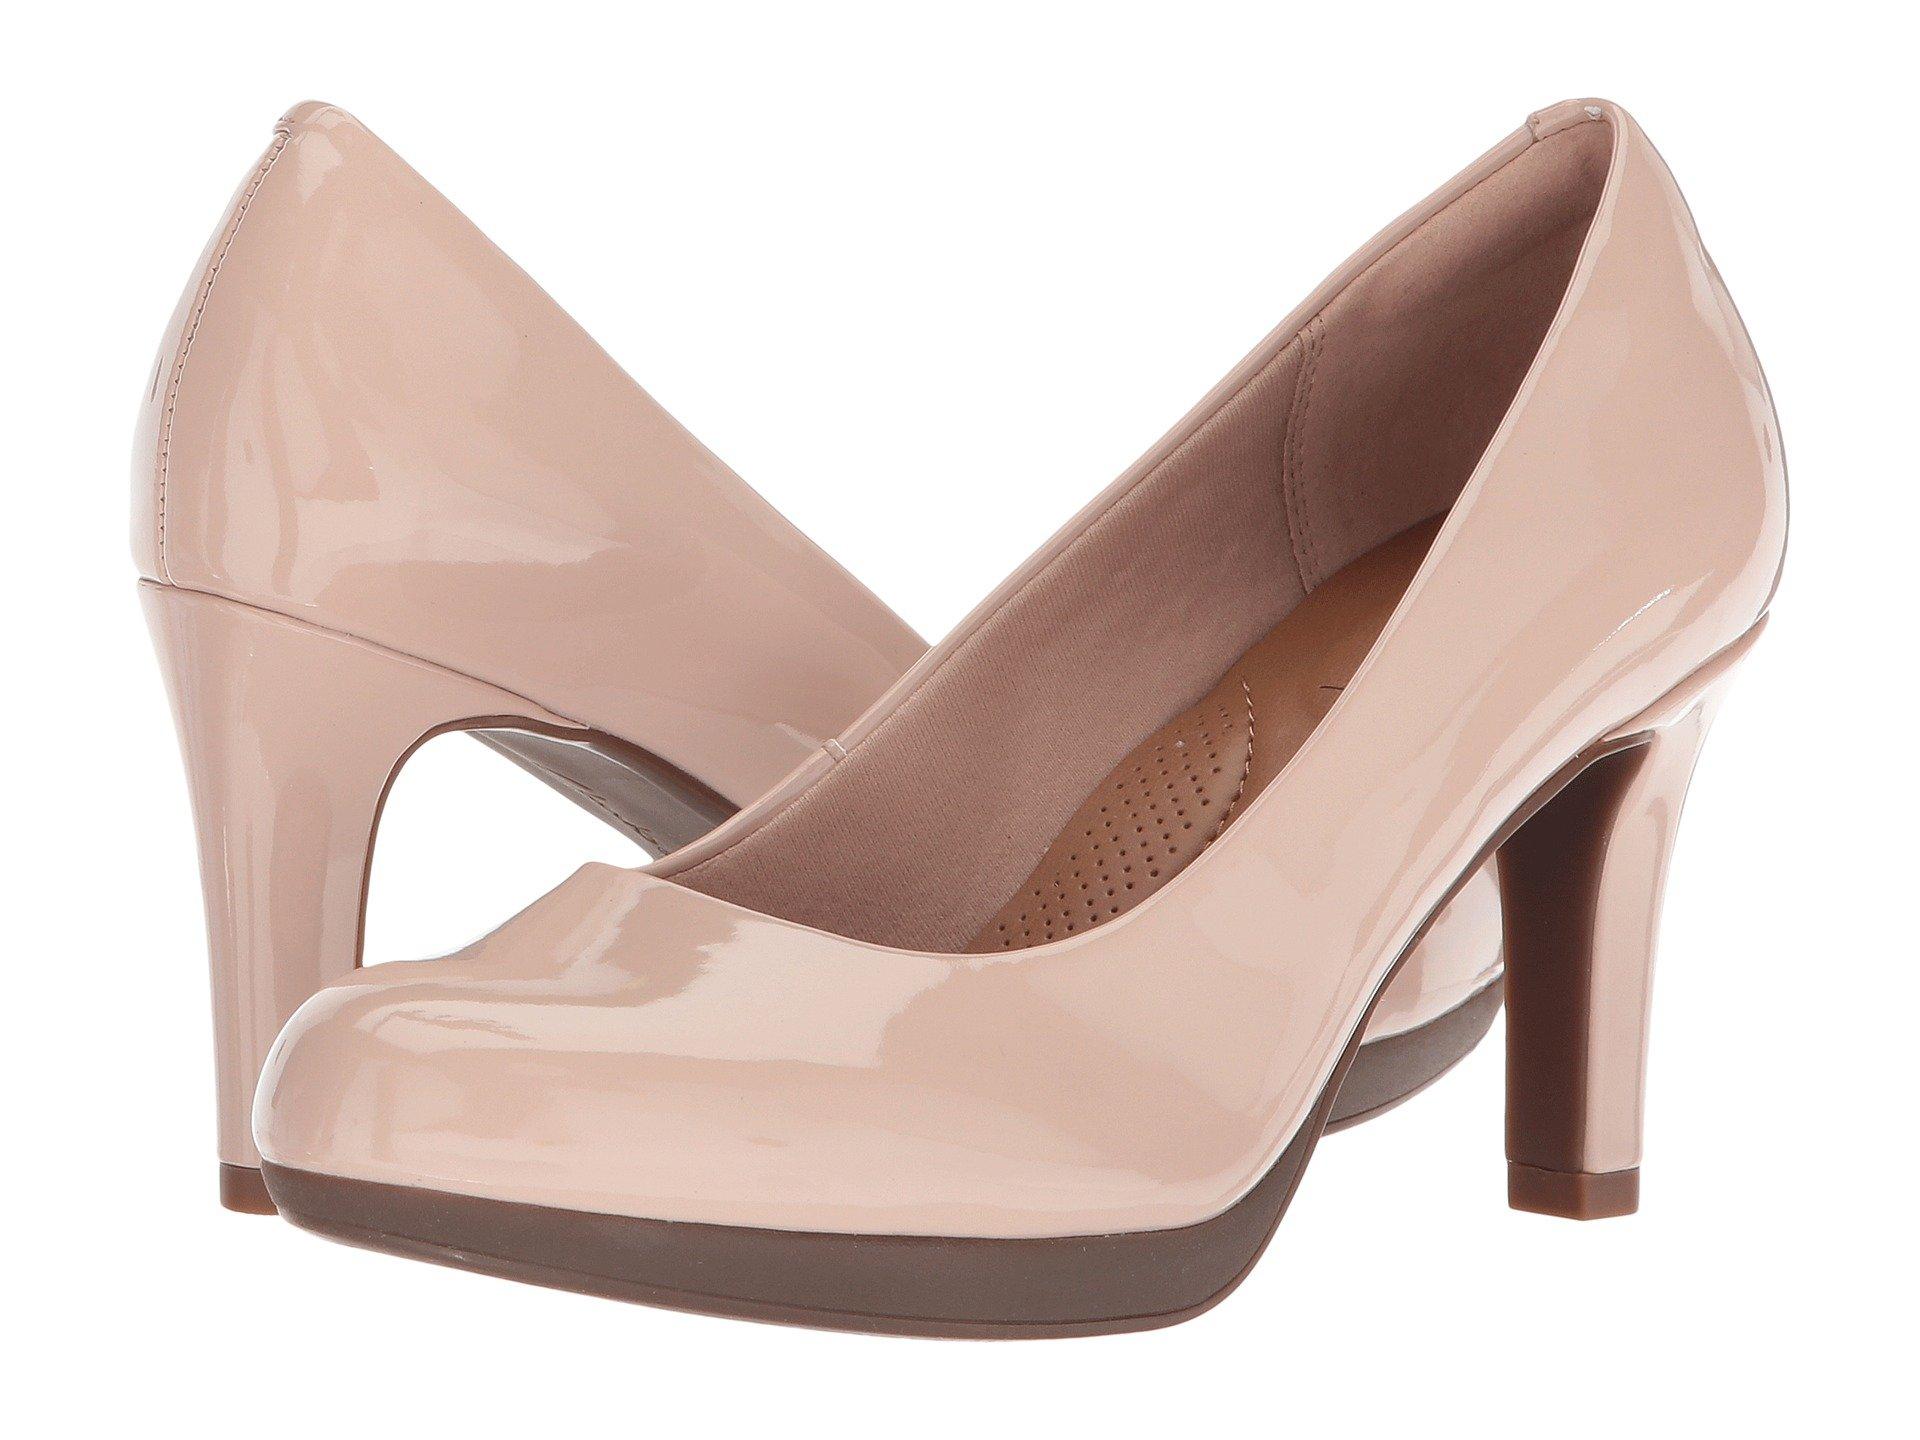 Adriel Pink Viola Dusty Viola Pink Clarks Pink Clarks Adriel Clarks Dusty Clarks Adriel Dusty Viola nwx8FOz